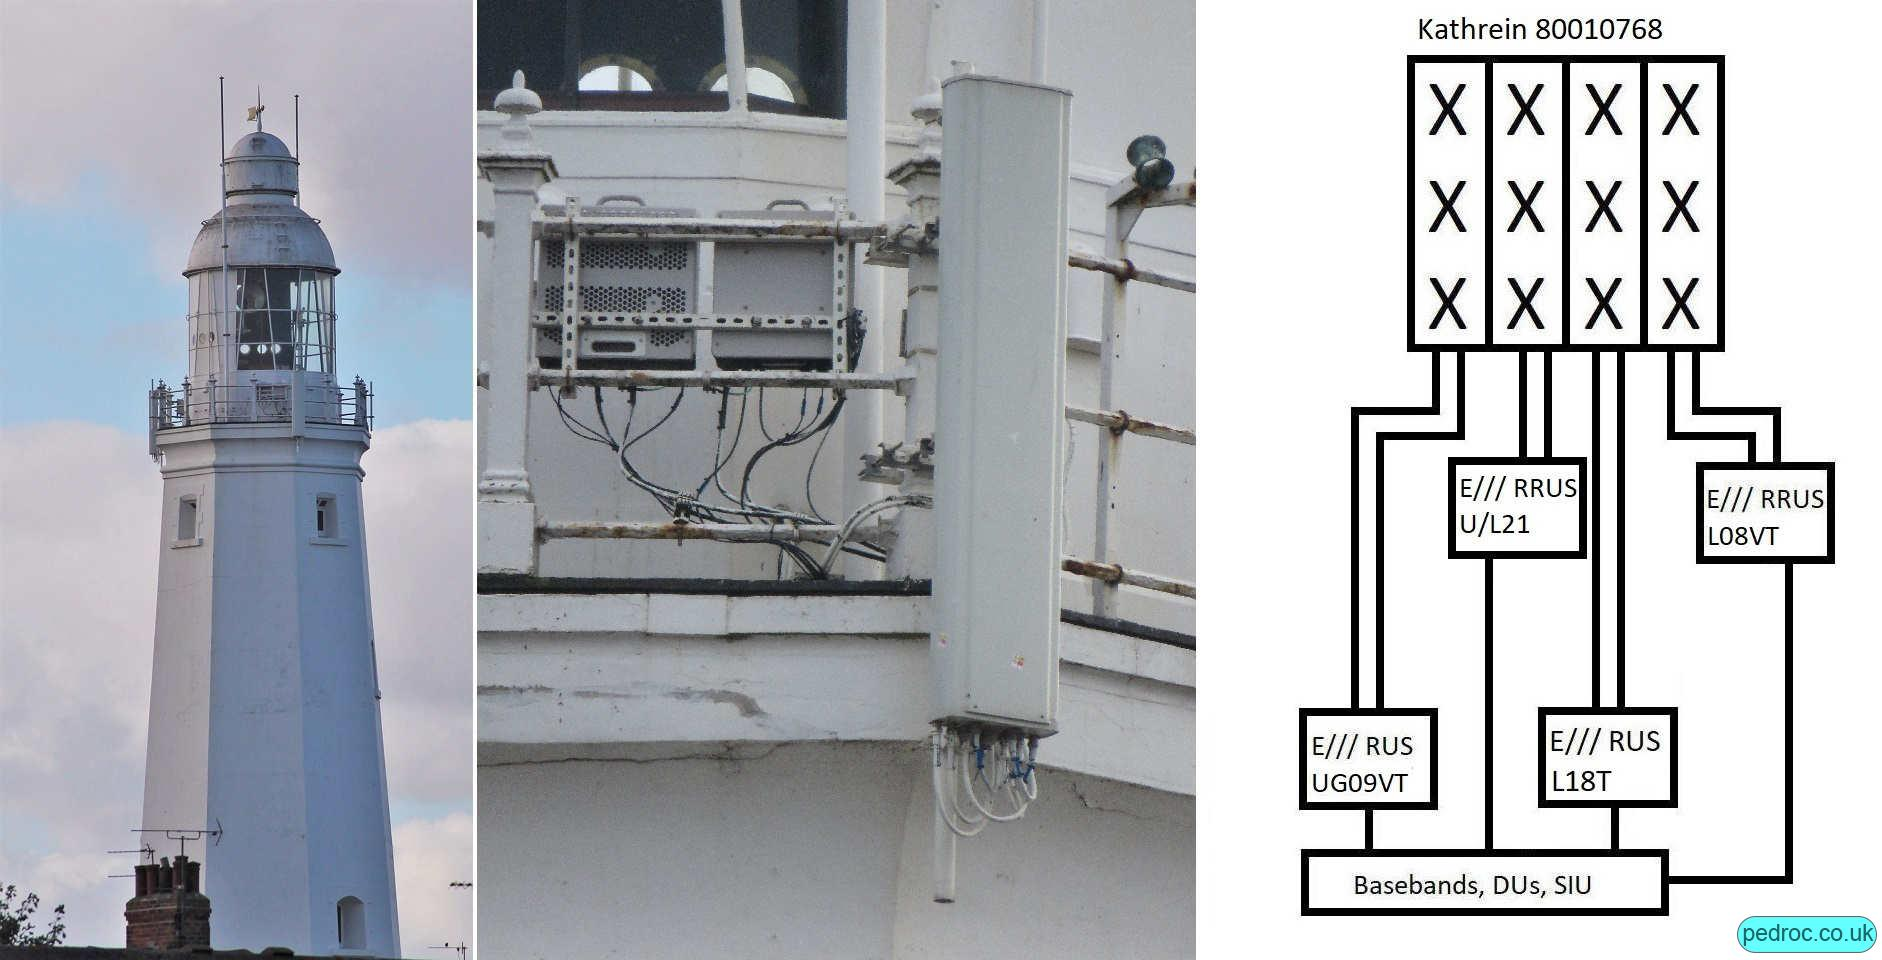 High Capacity Configuration using Kathrein quad band 80010768 antennas. UG09, L18, L08 off RRUS11, U/L21 off RRUS12.